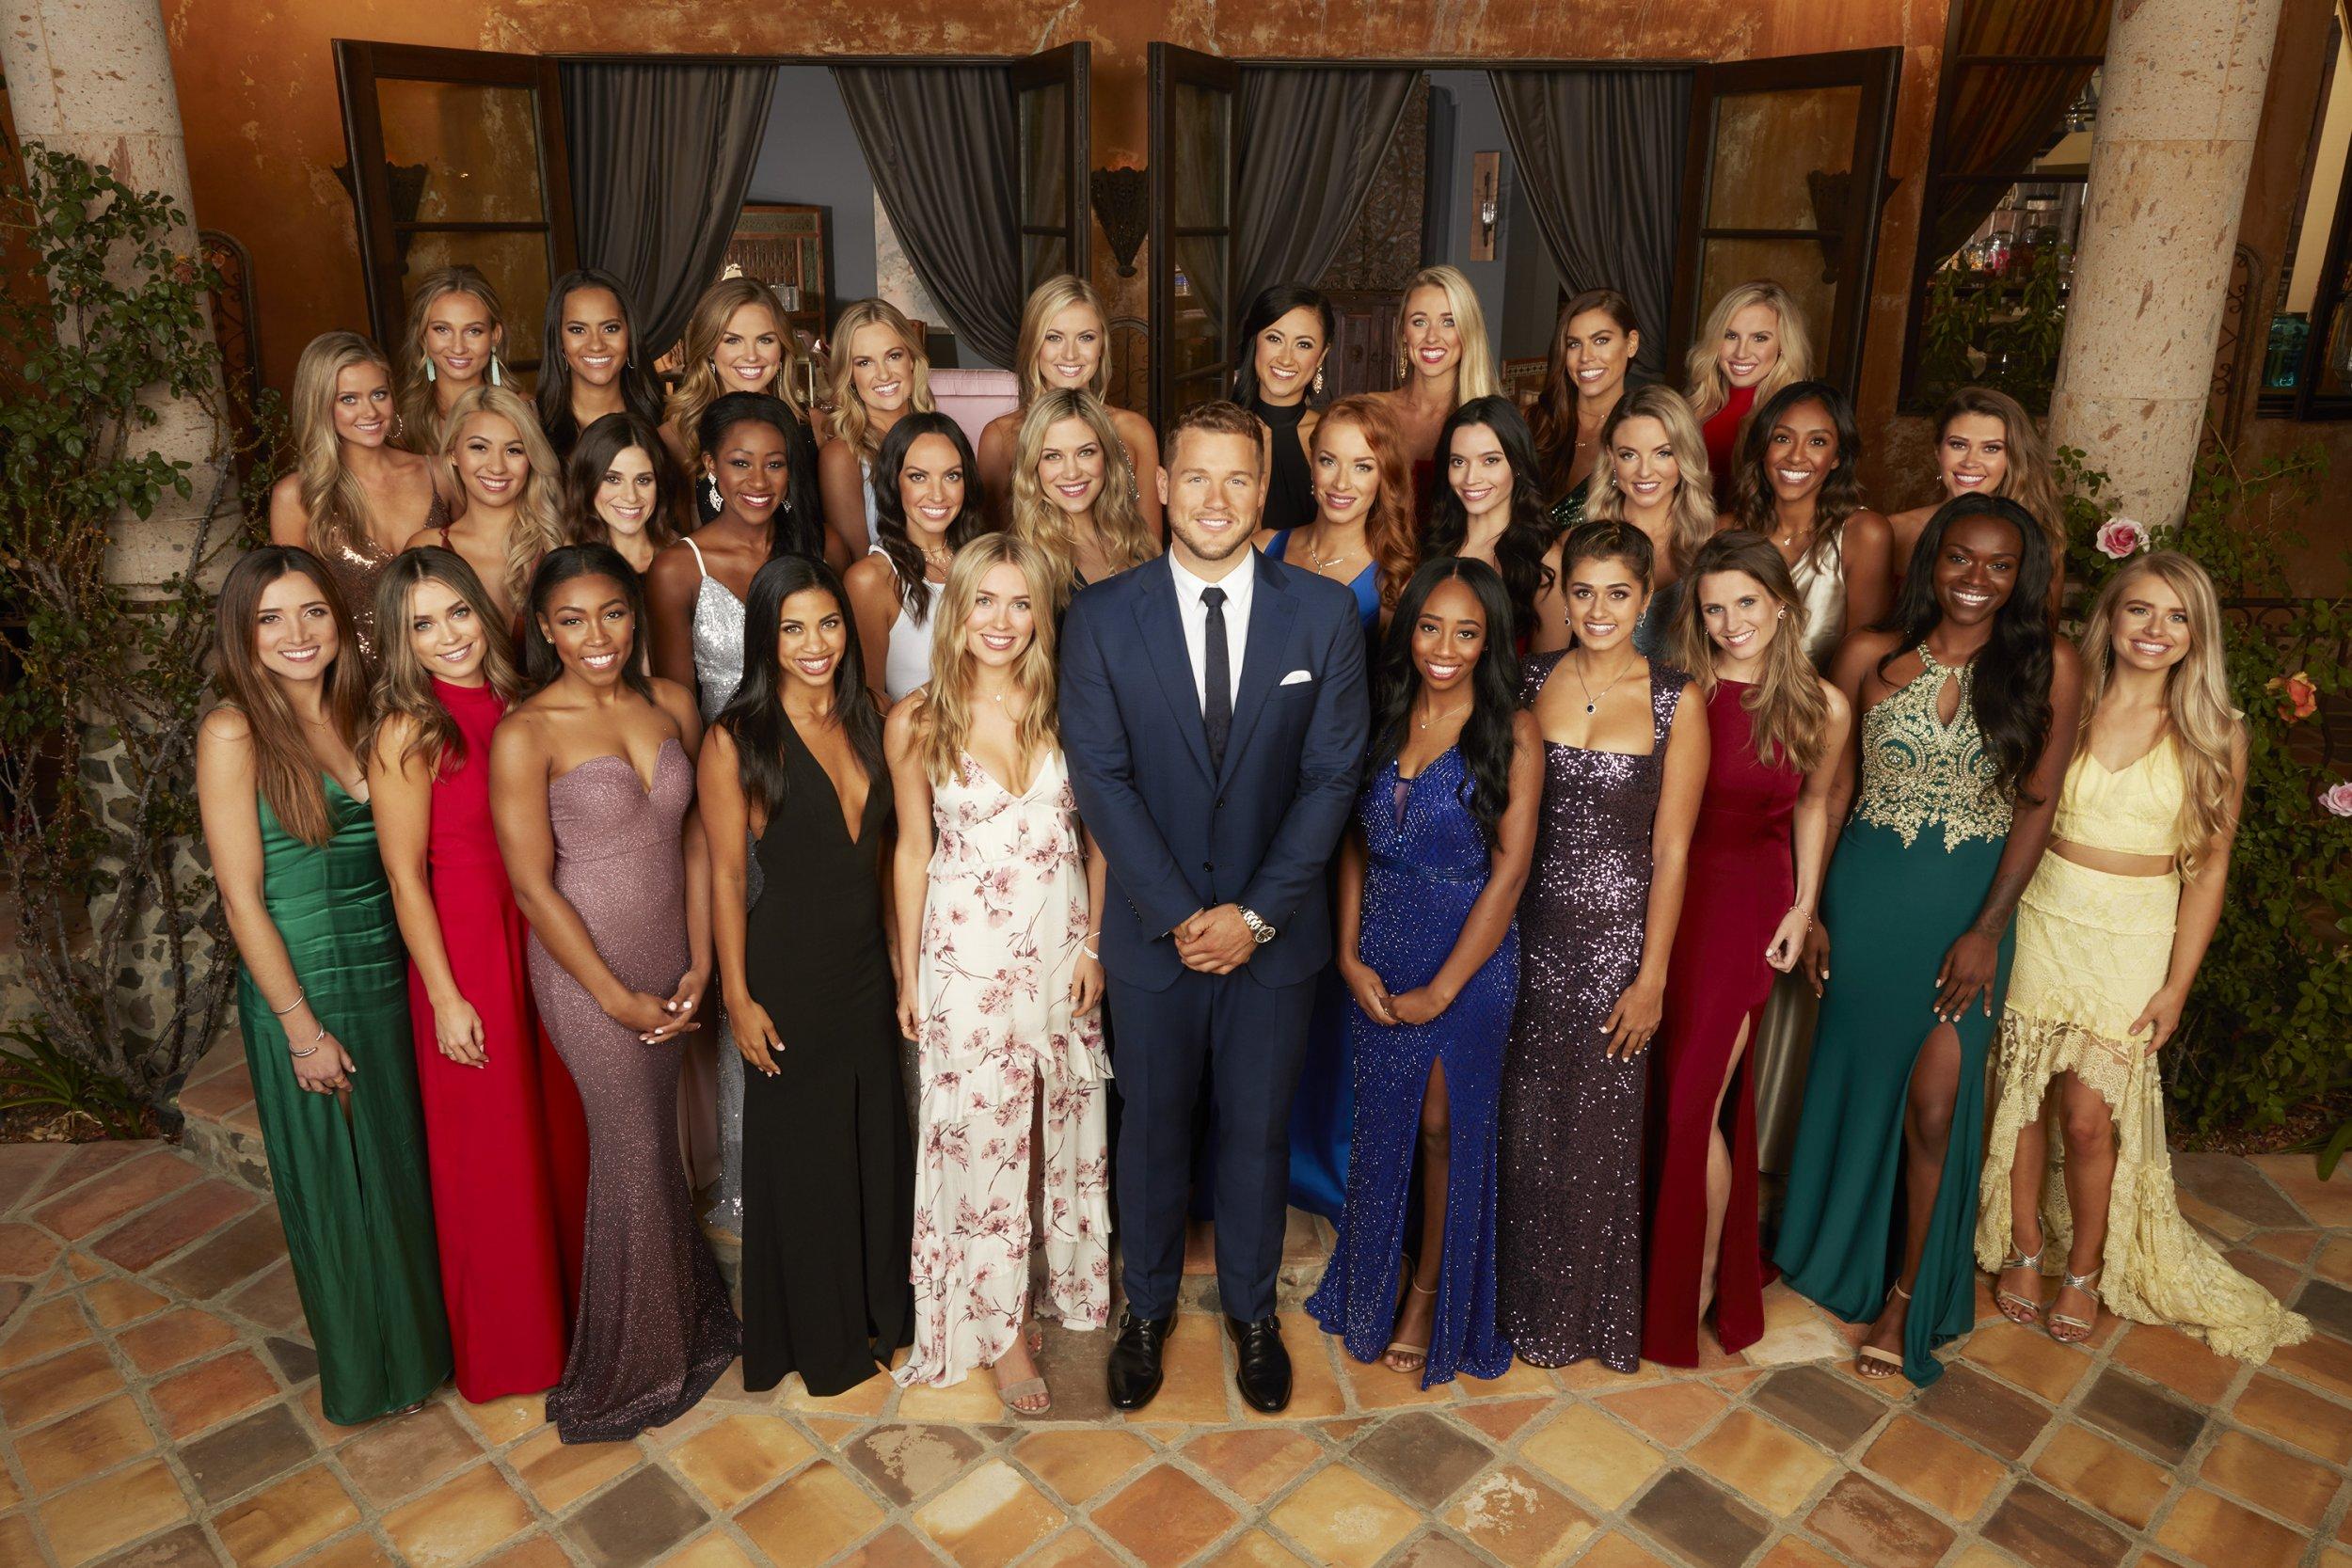 Bachelor Season 23 Cast with Colton Underwood